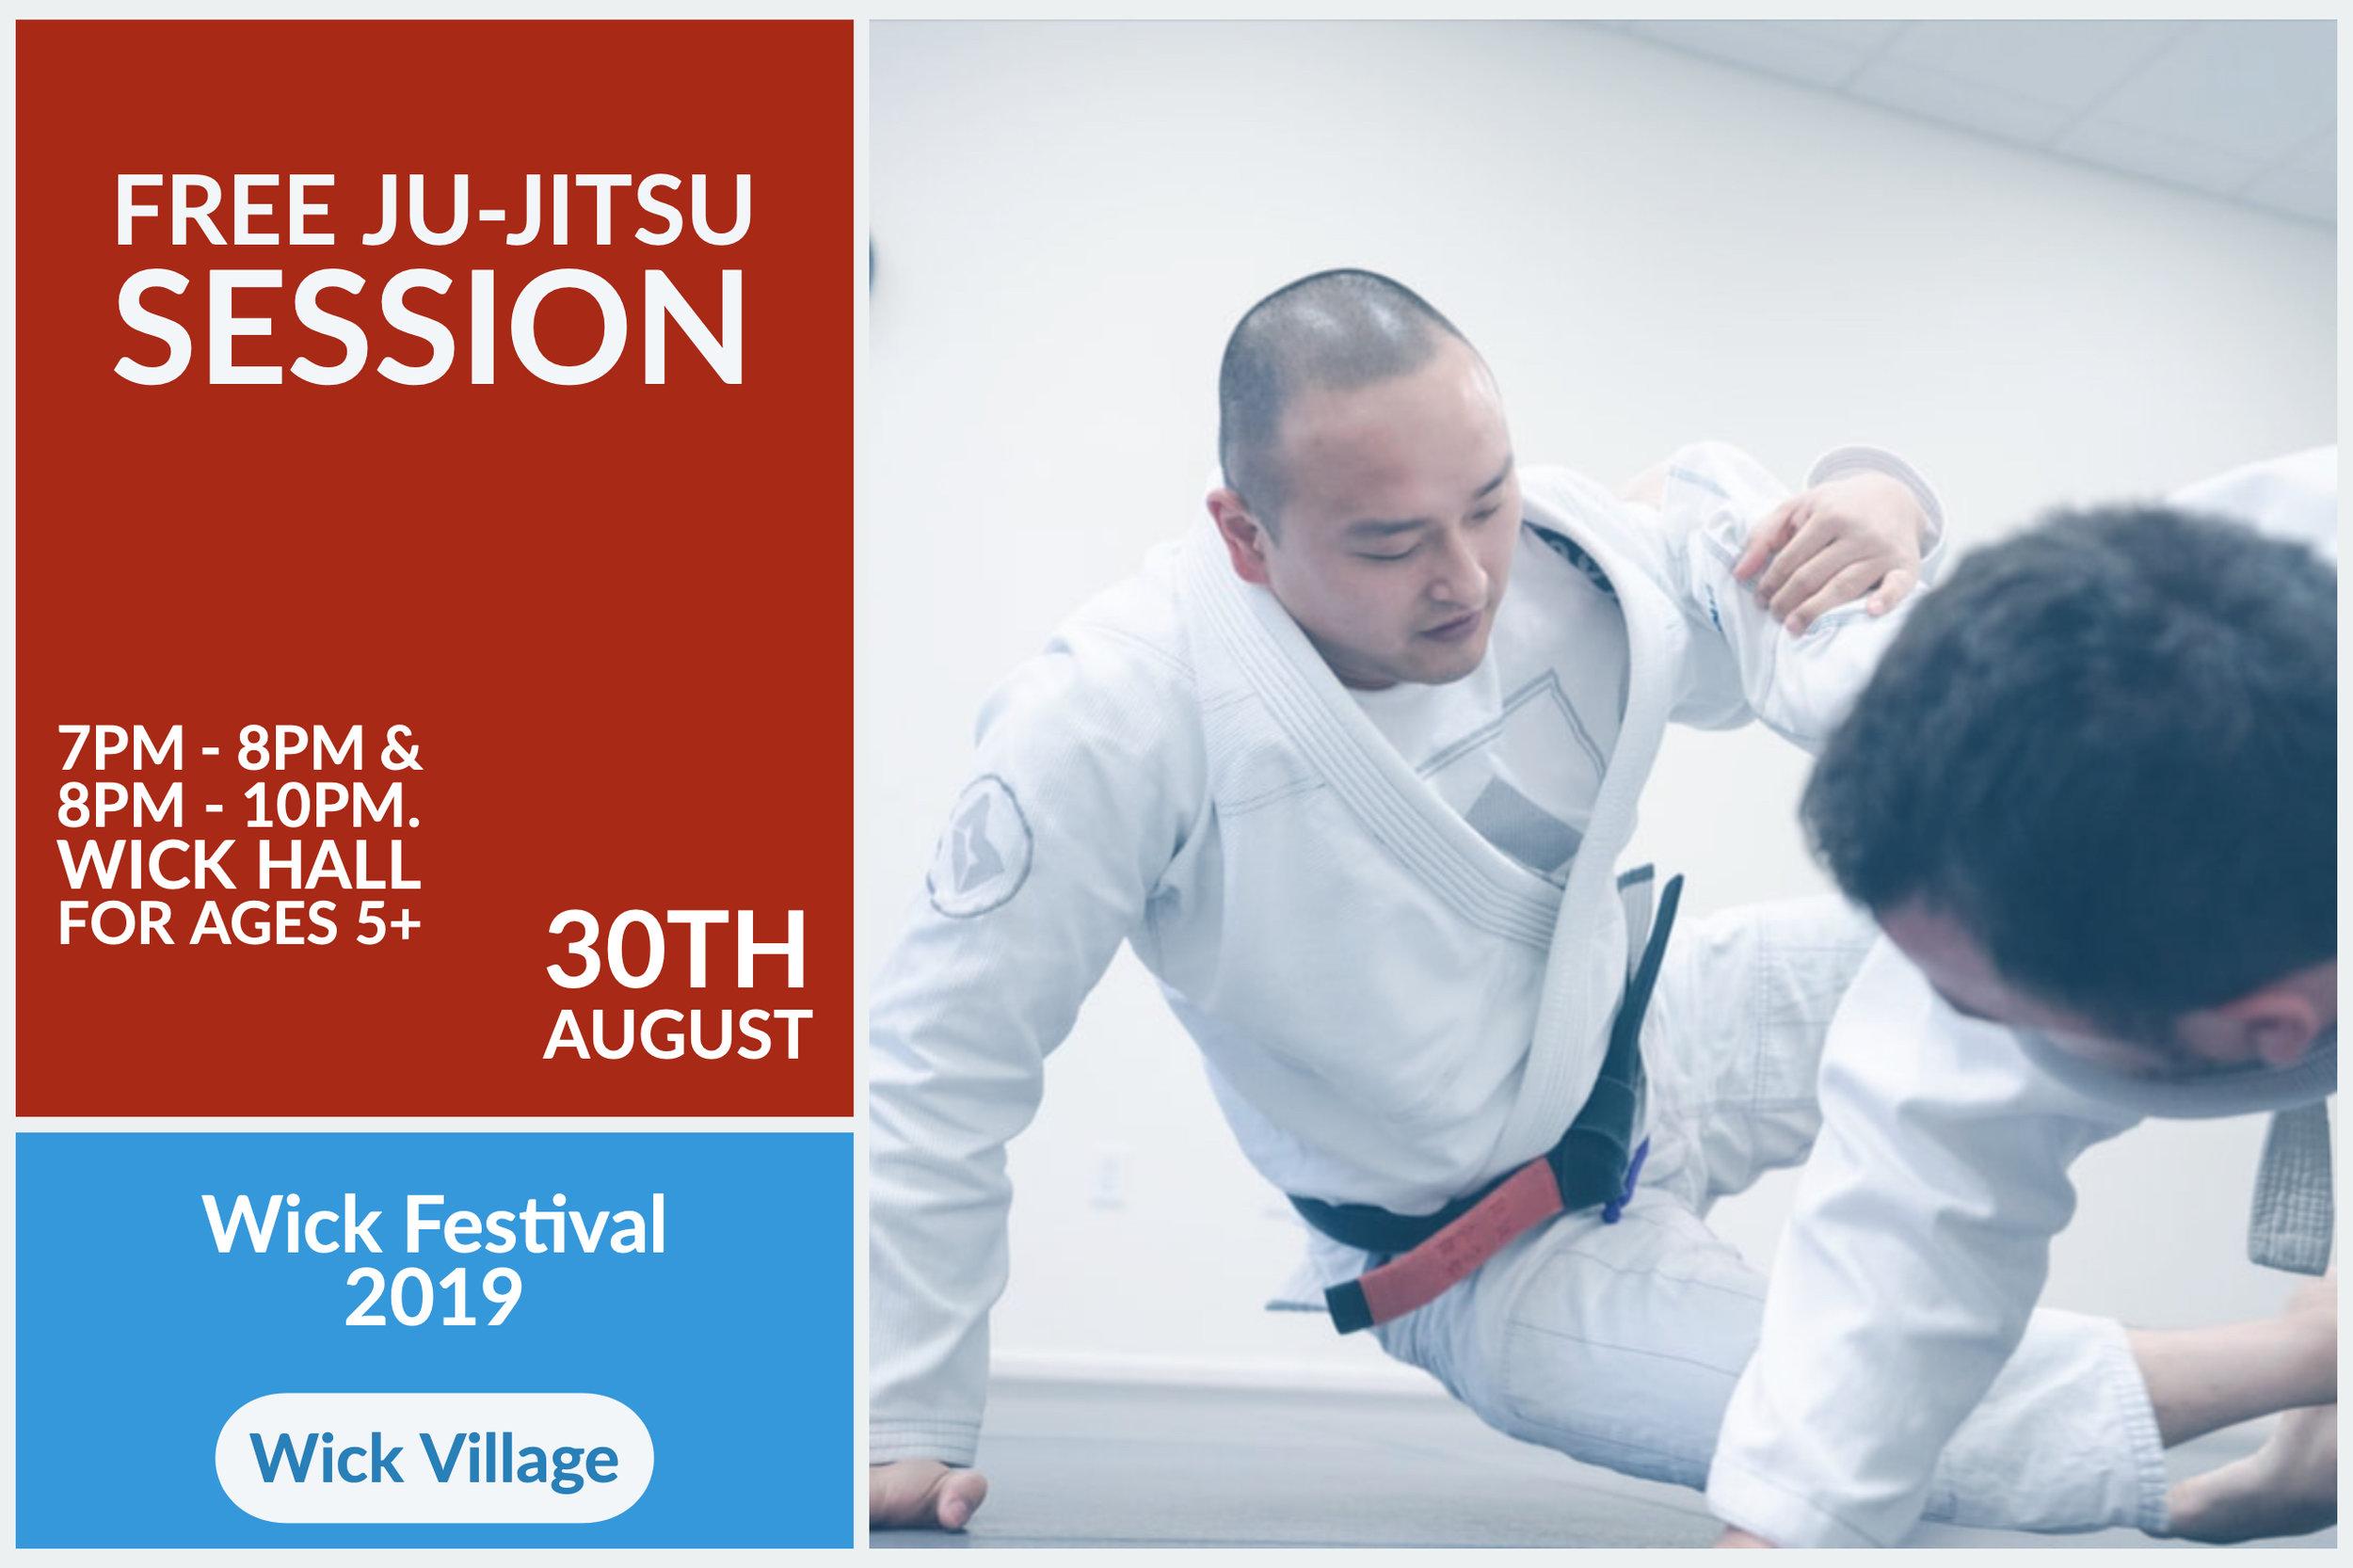 Wick Festival - Free Ju-Jitsu Session